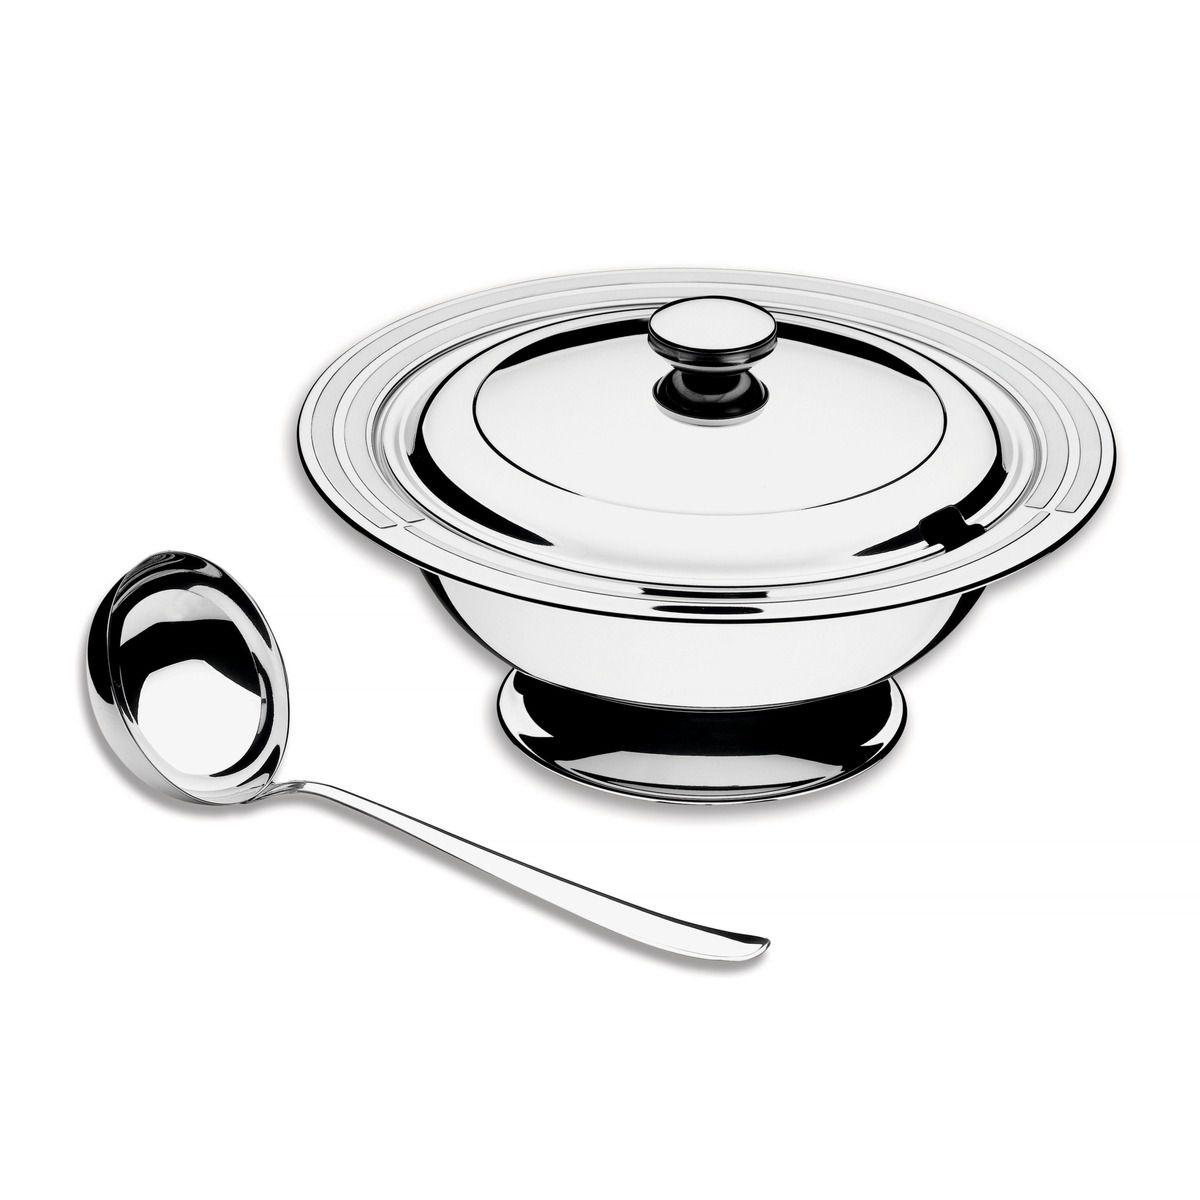 Kit para Sopa Tramontina Ciclo em Aço Inox 2 Peças 64510/310 | Lojas Estrela